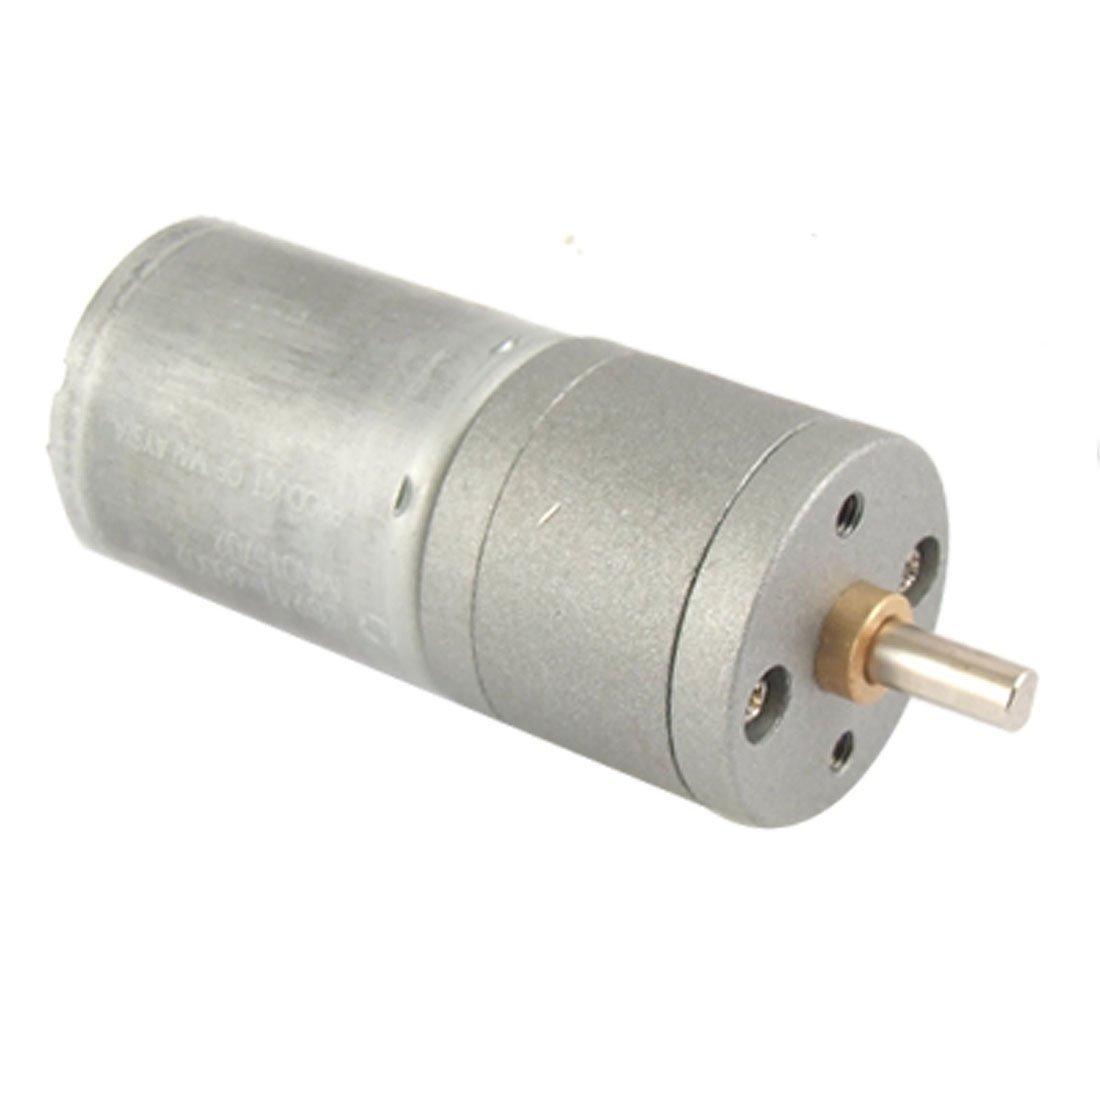 5 500rpm dc 3 24v high torque gear box electric speed reduce motor ...